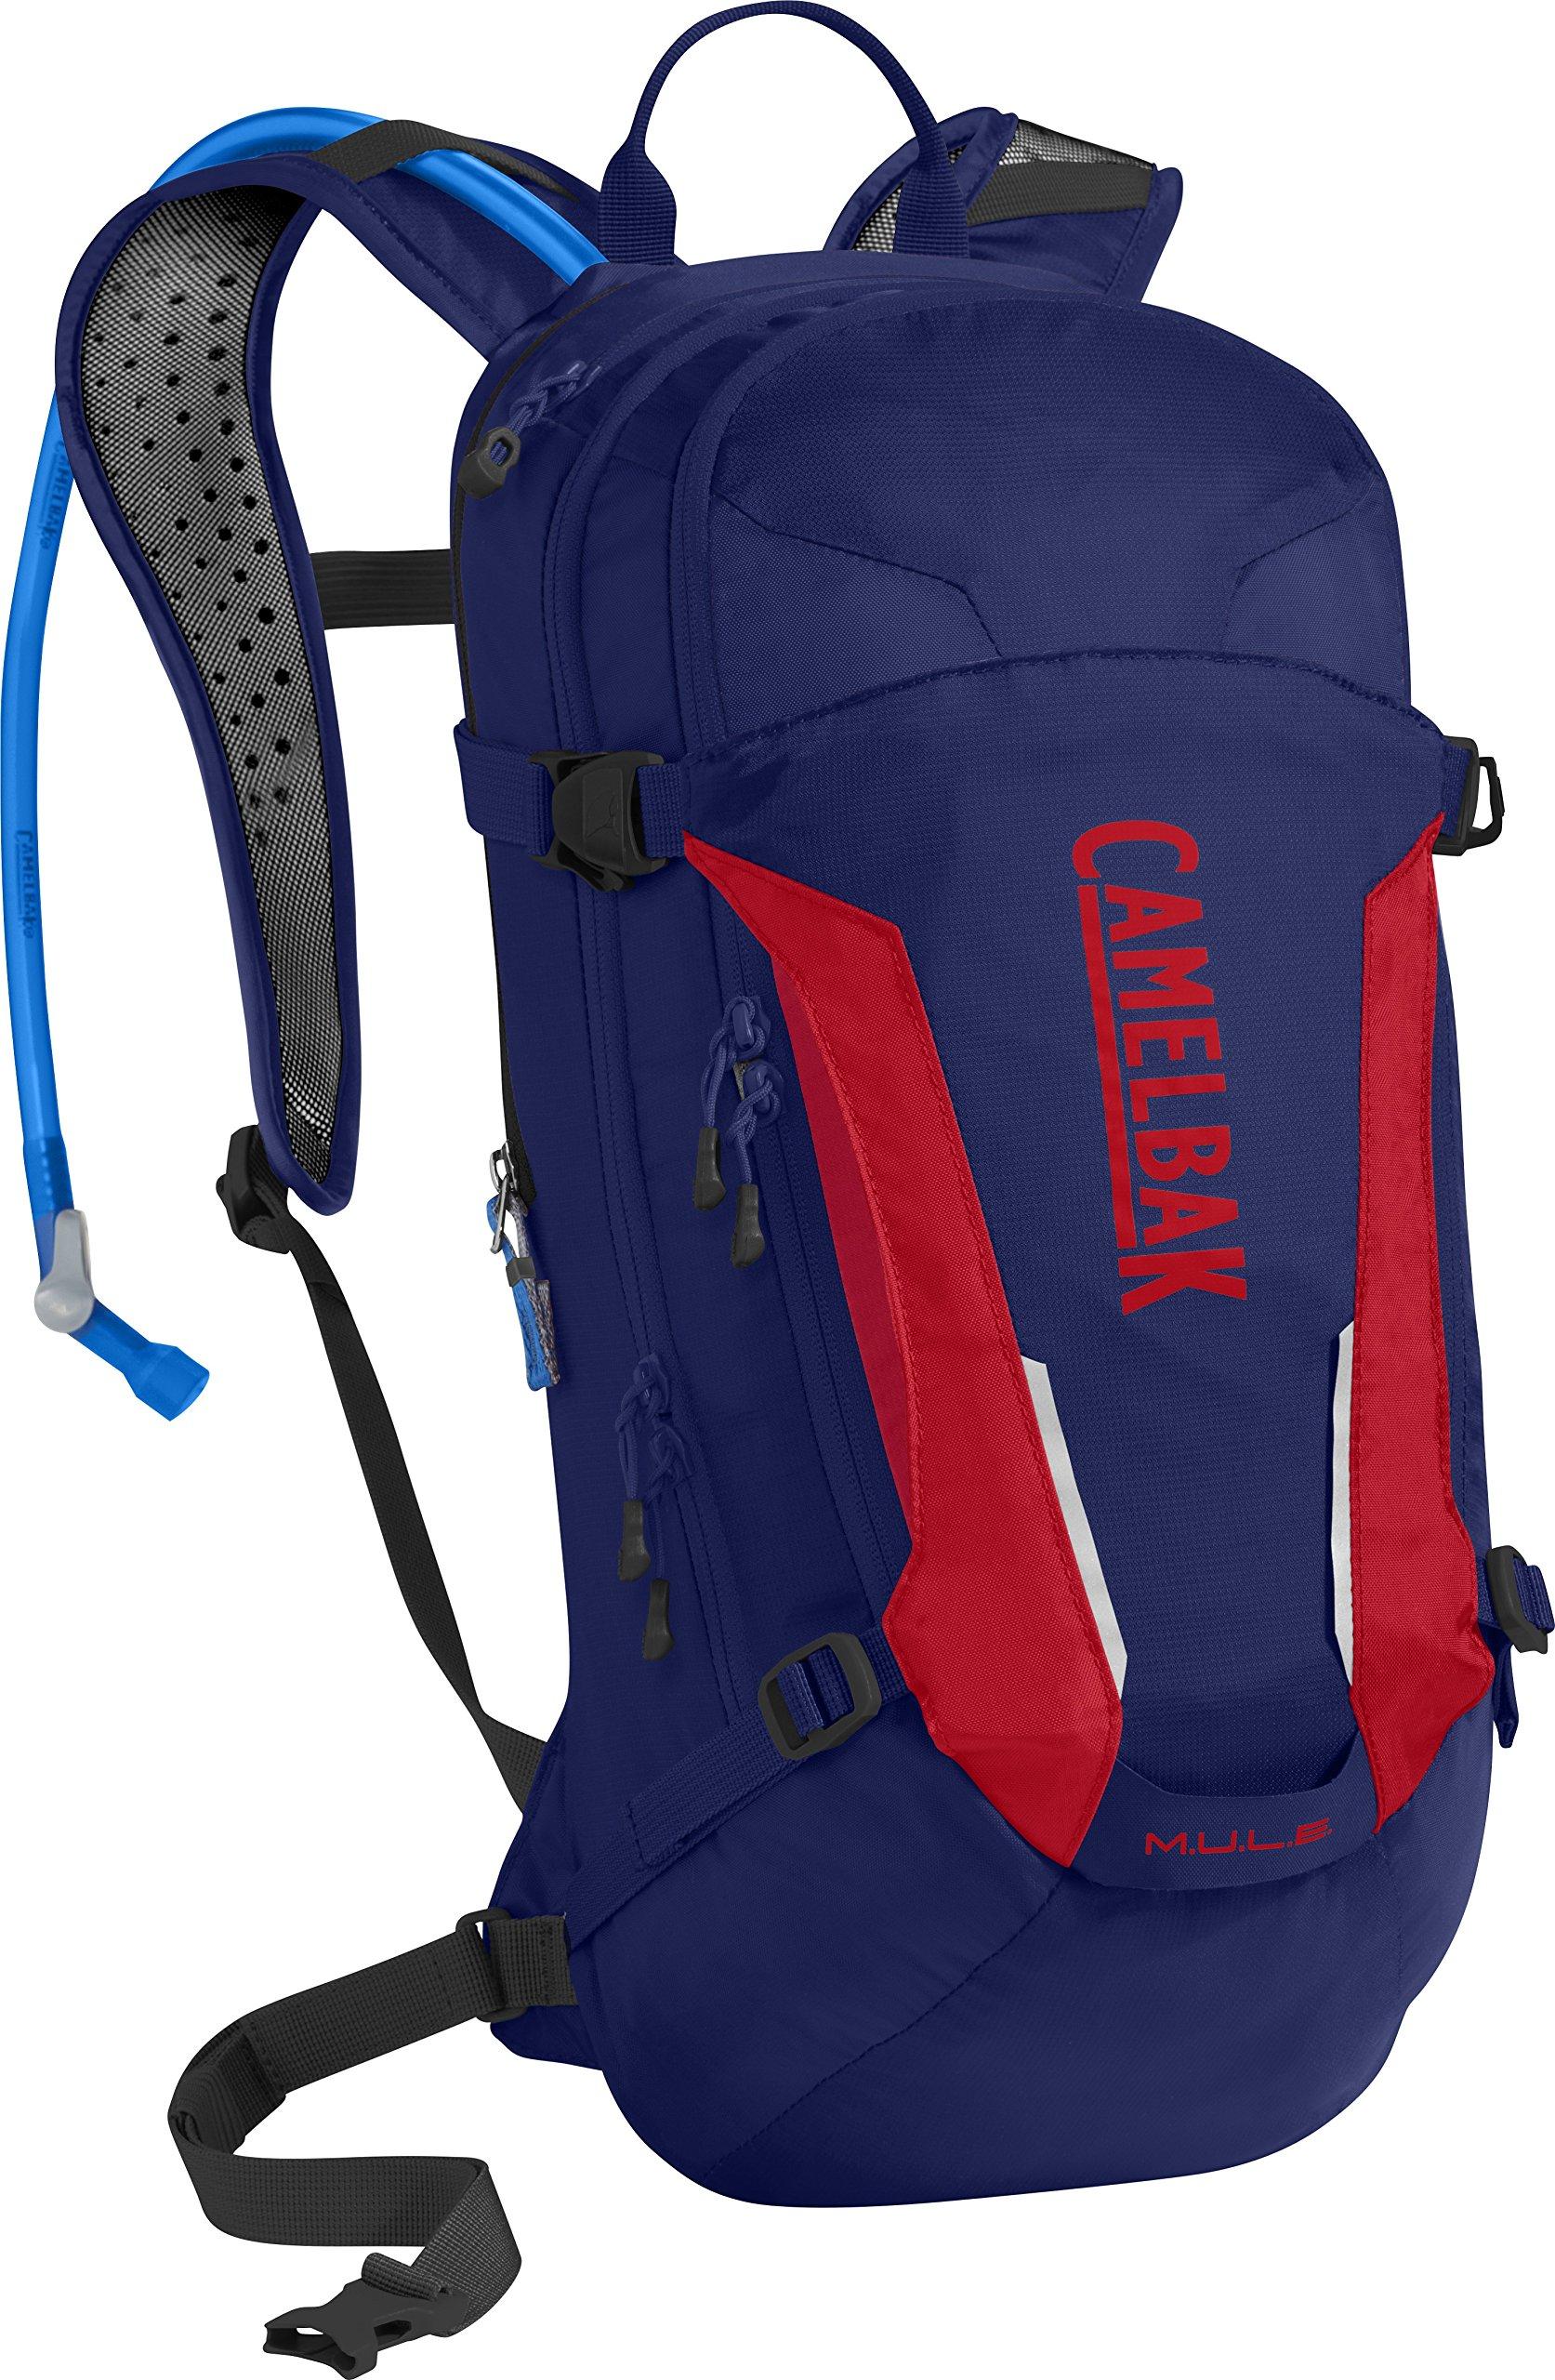 CamelBak M.U.L.E. 100 oz Hydration Pack, Pitch Blue/Racing Red by CamelBak